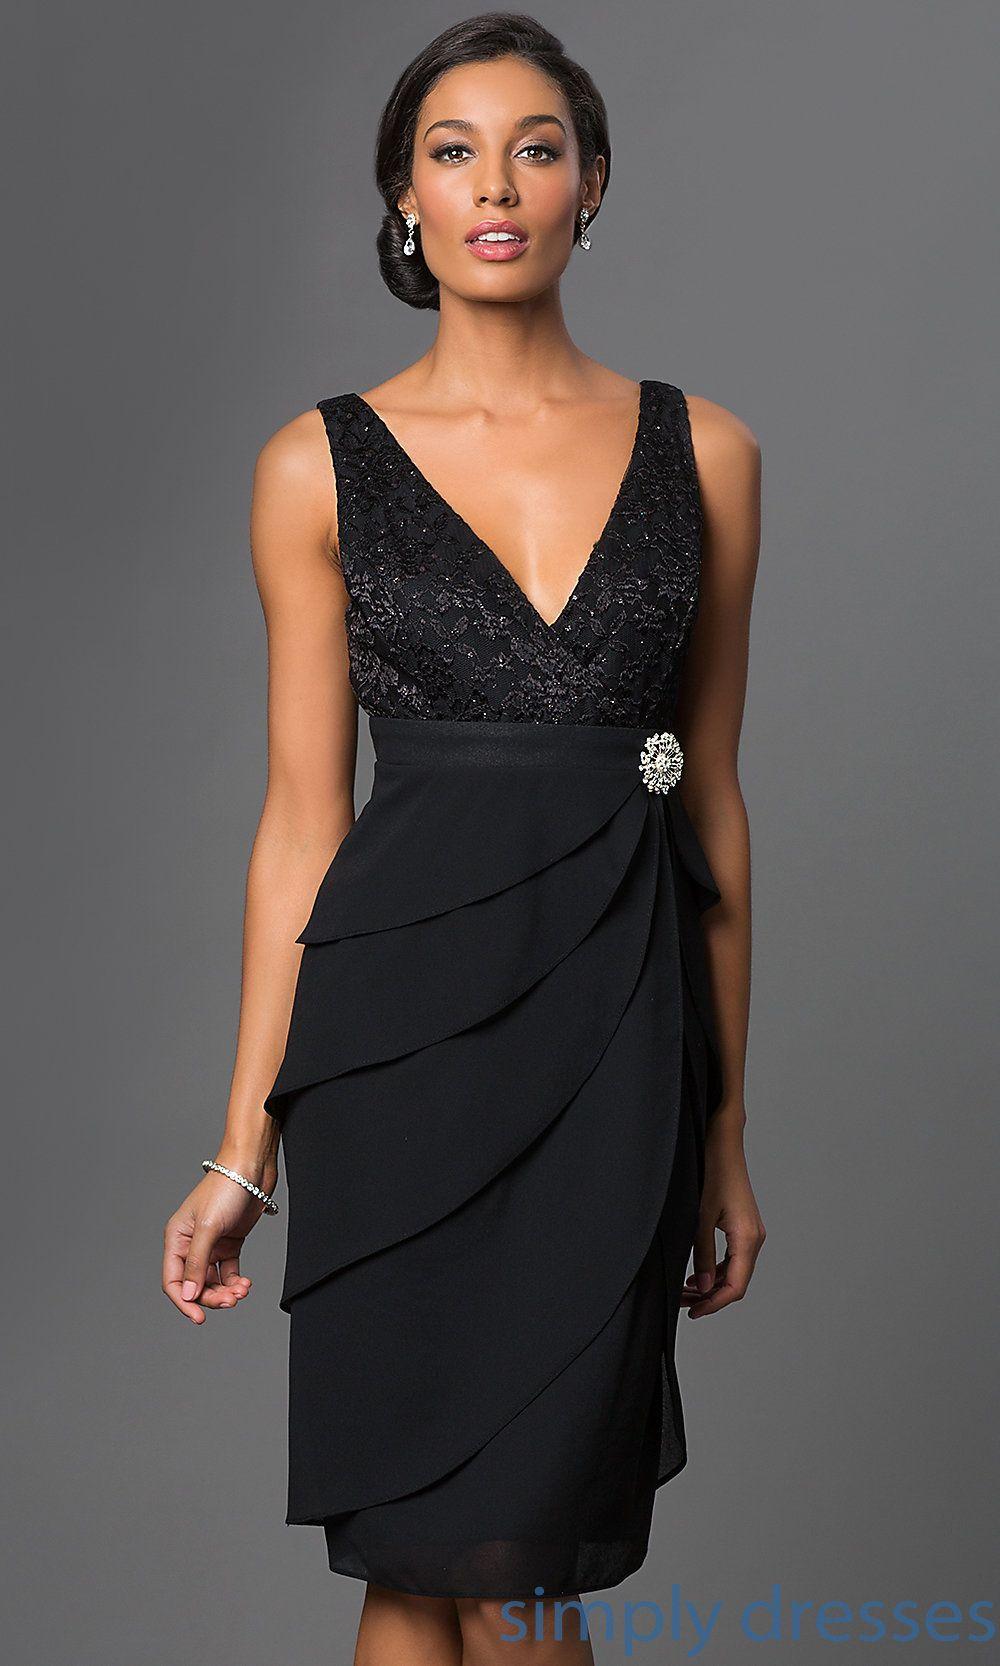 Knee-Length Sally Fashion Dress with Jacket | MOTB | Dresses, Jacket ...